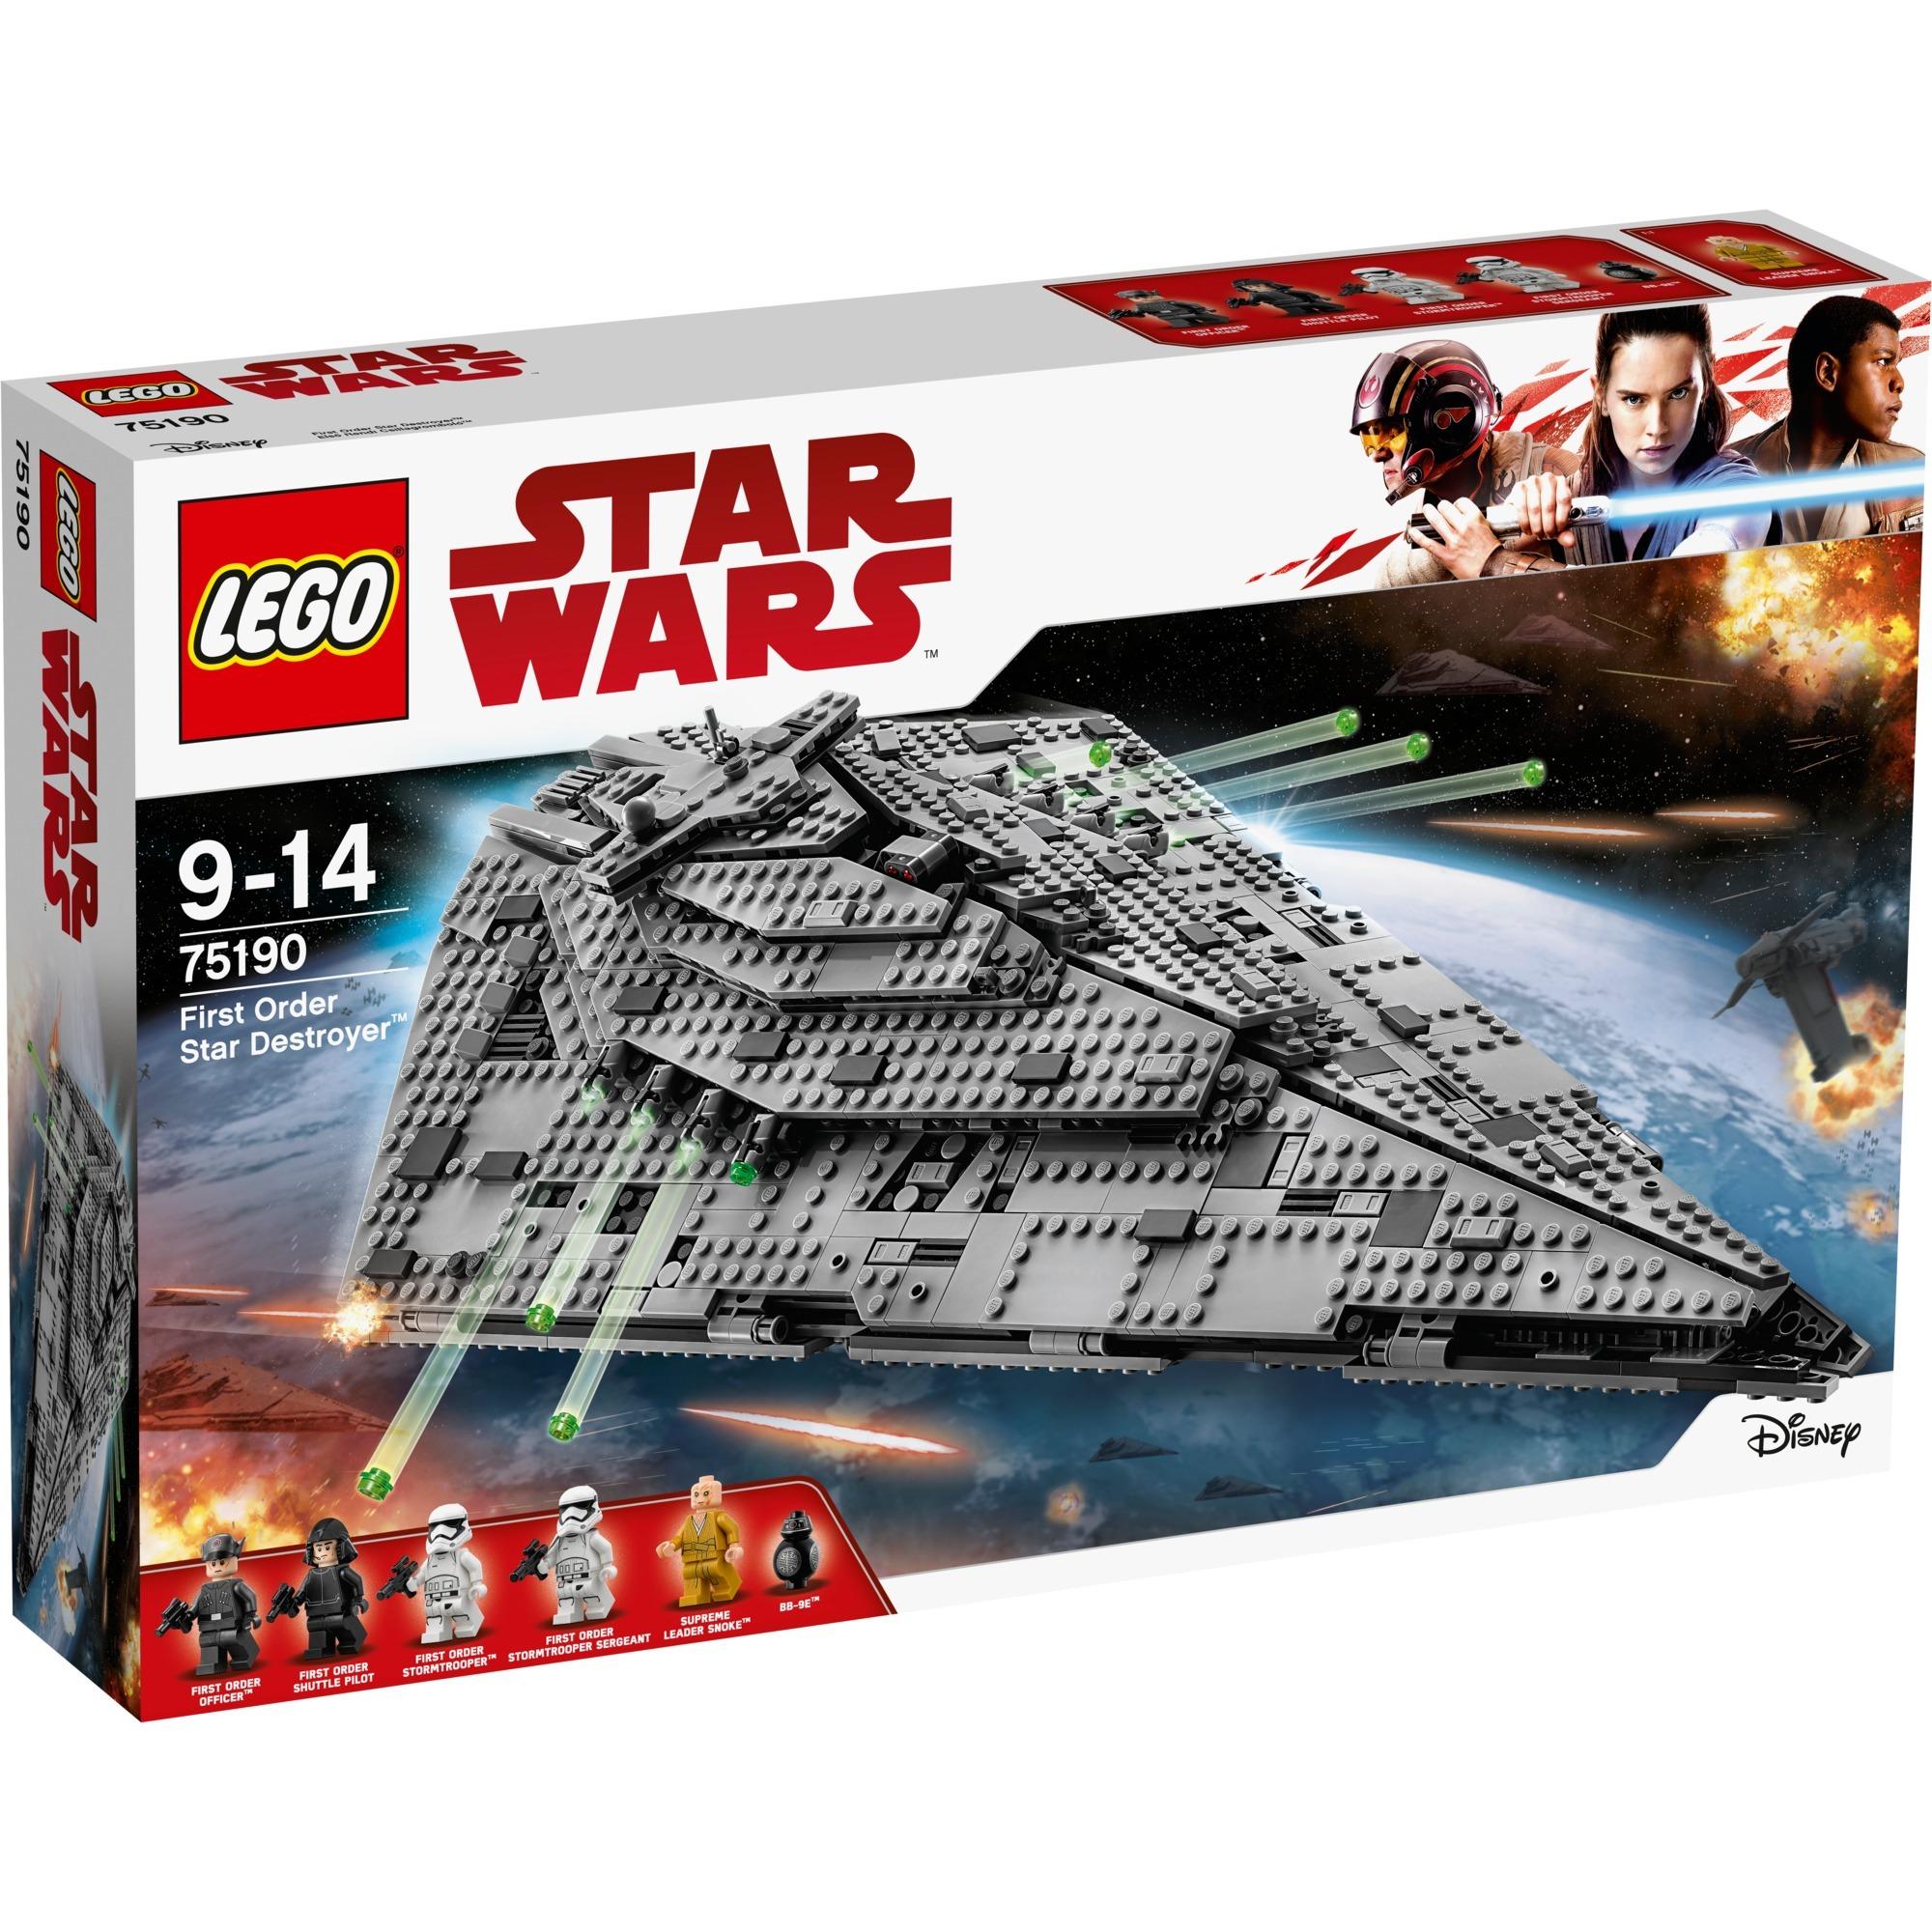 Star Wars - First Order Star Destroyer, Jouets de construction